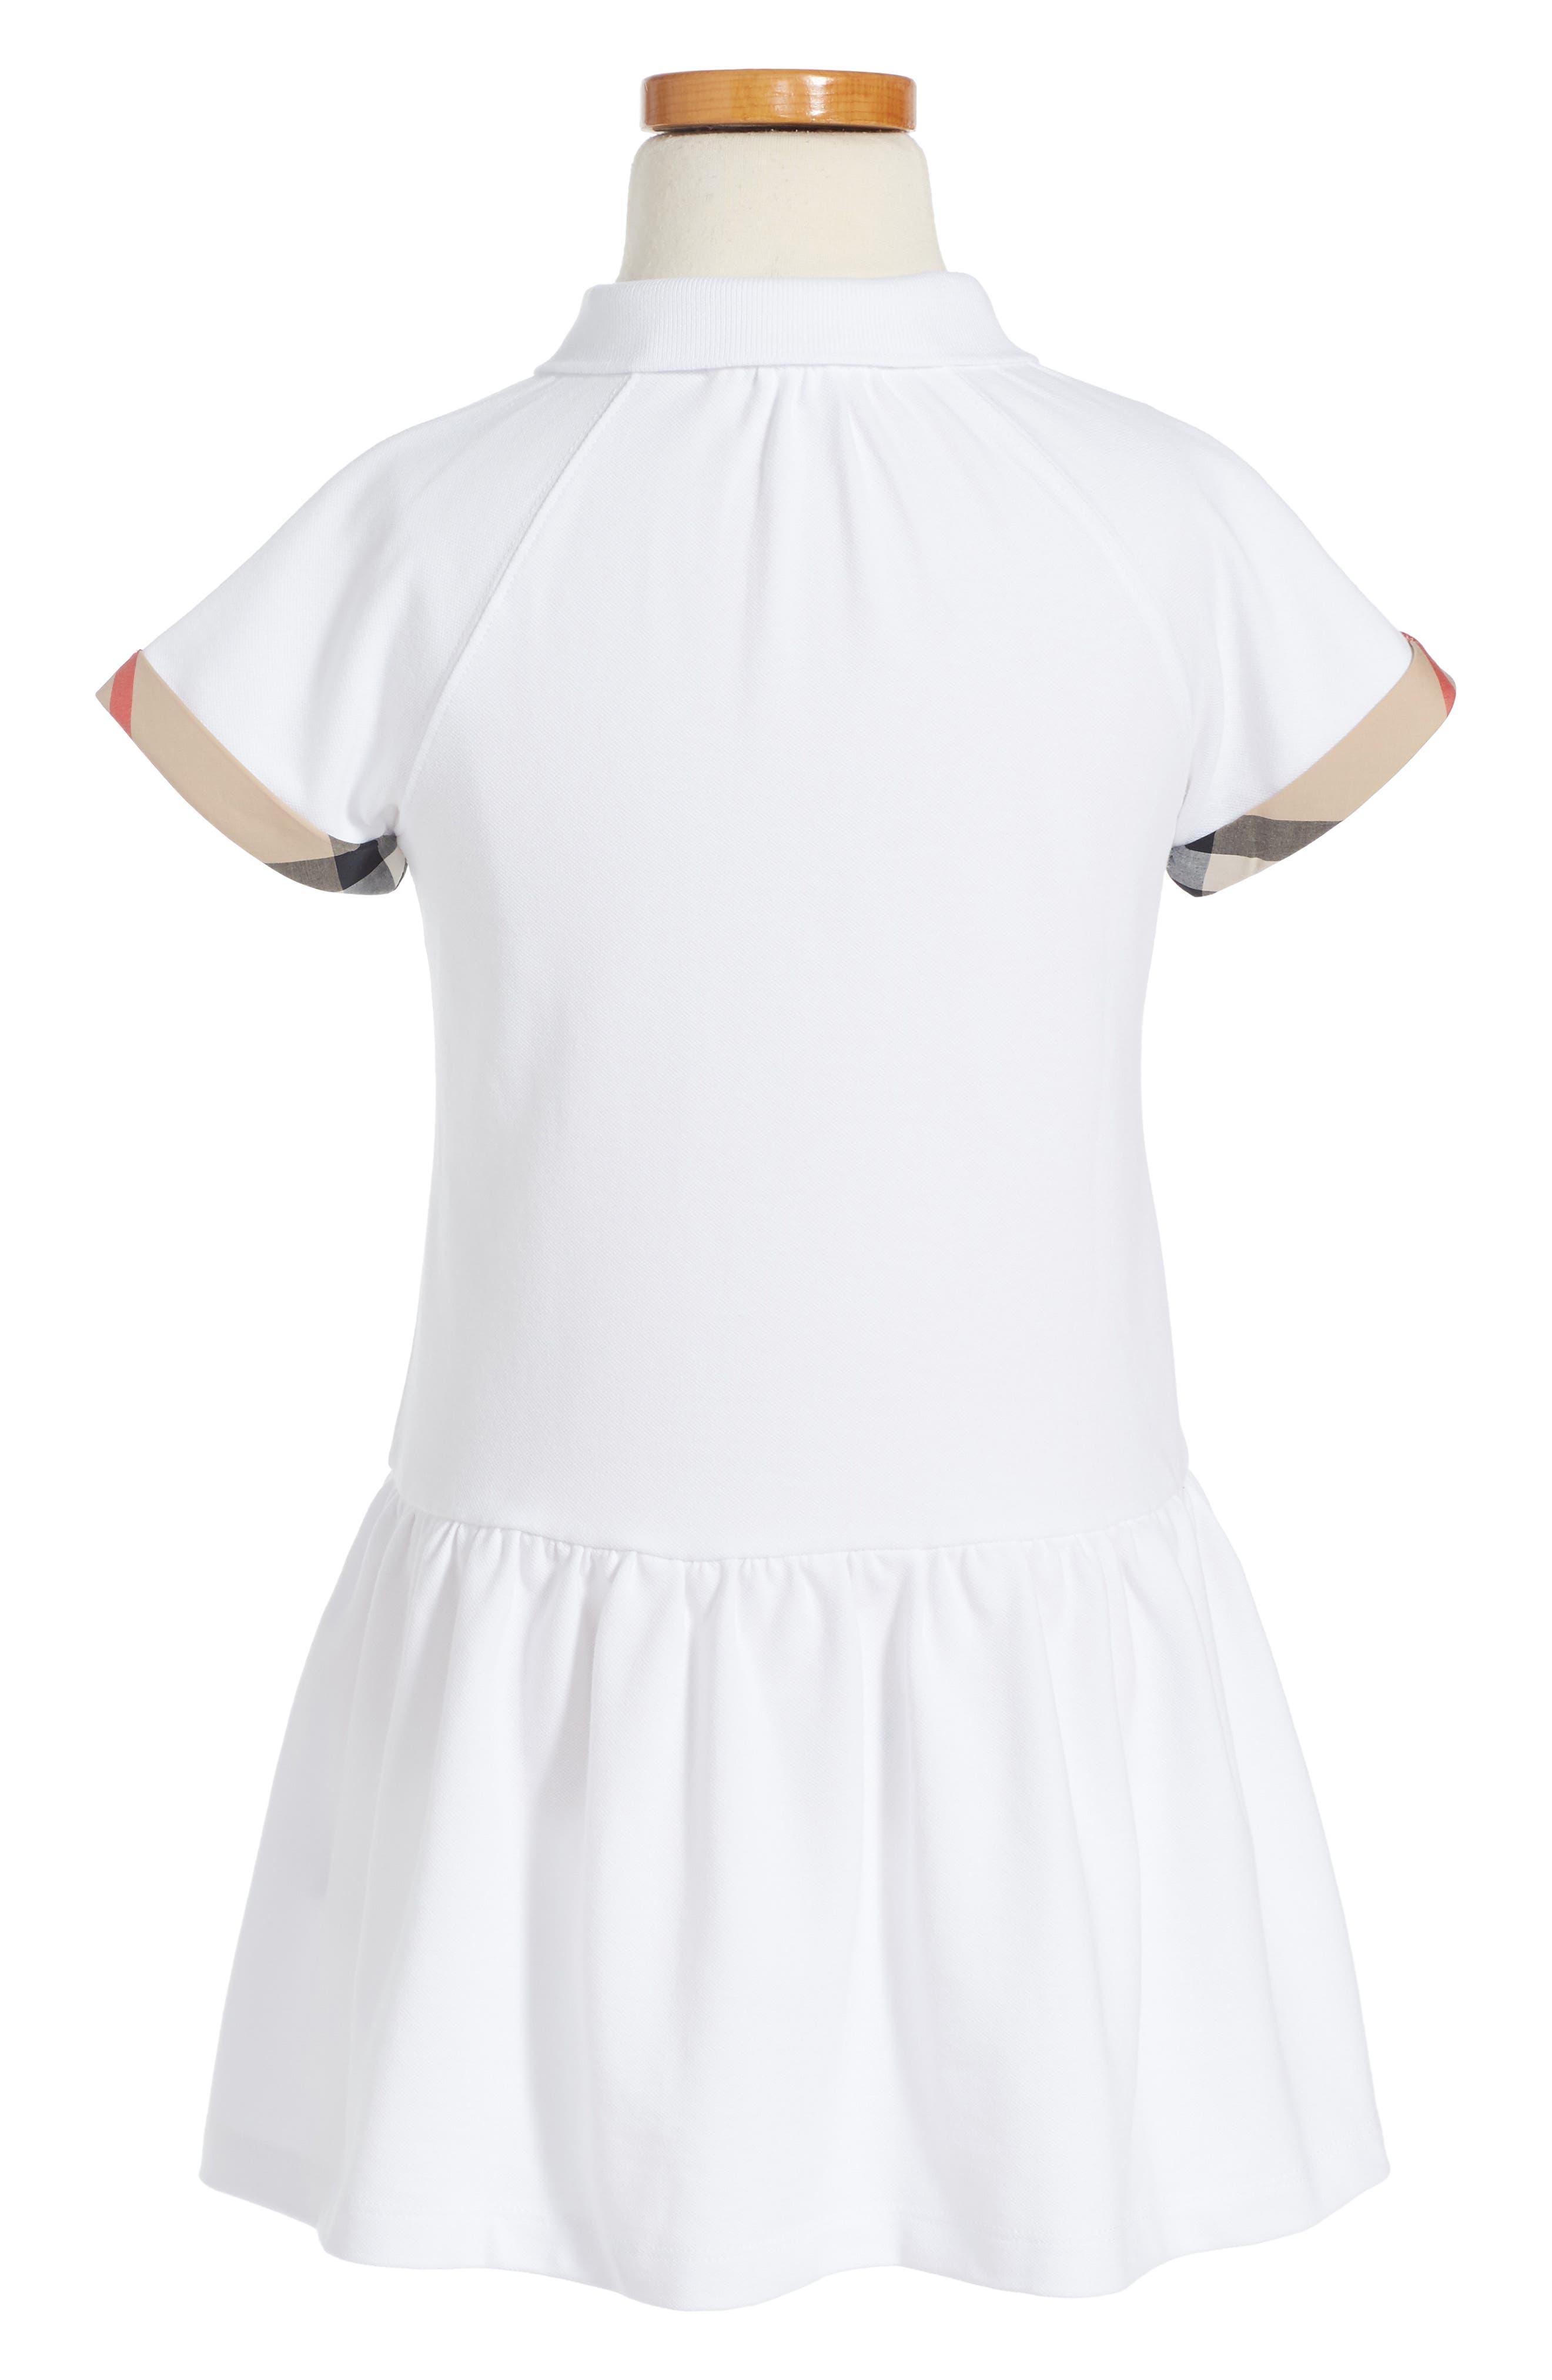 Alternate Image 2  - Burberry Cali Dress (Little Girls & Big Girls)